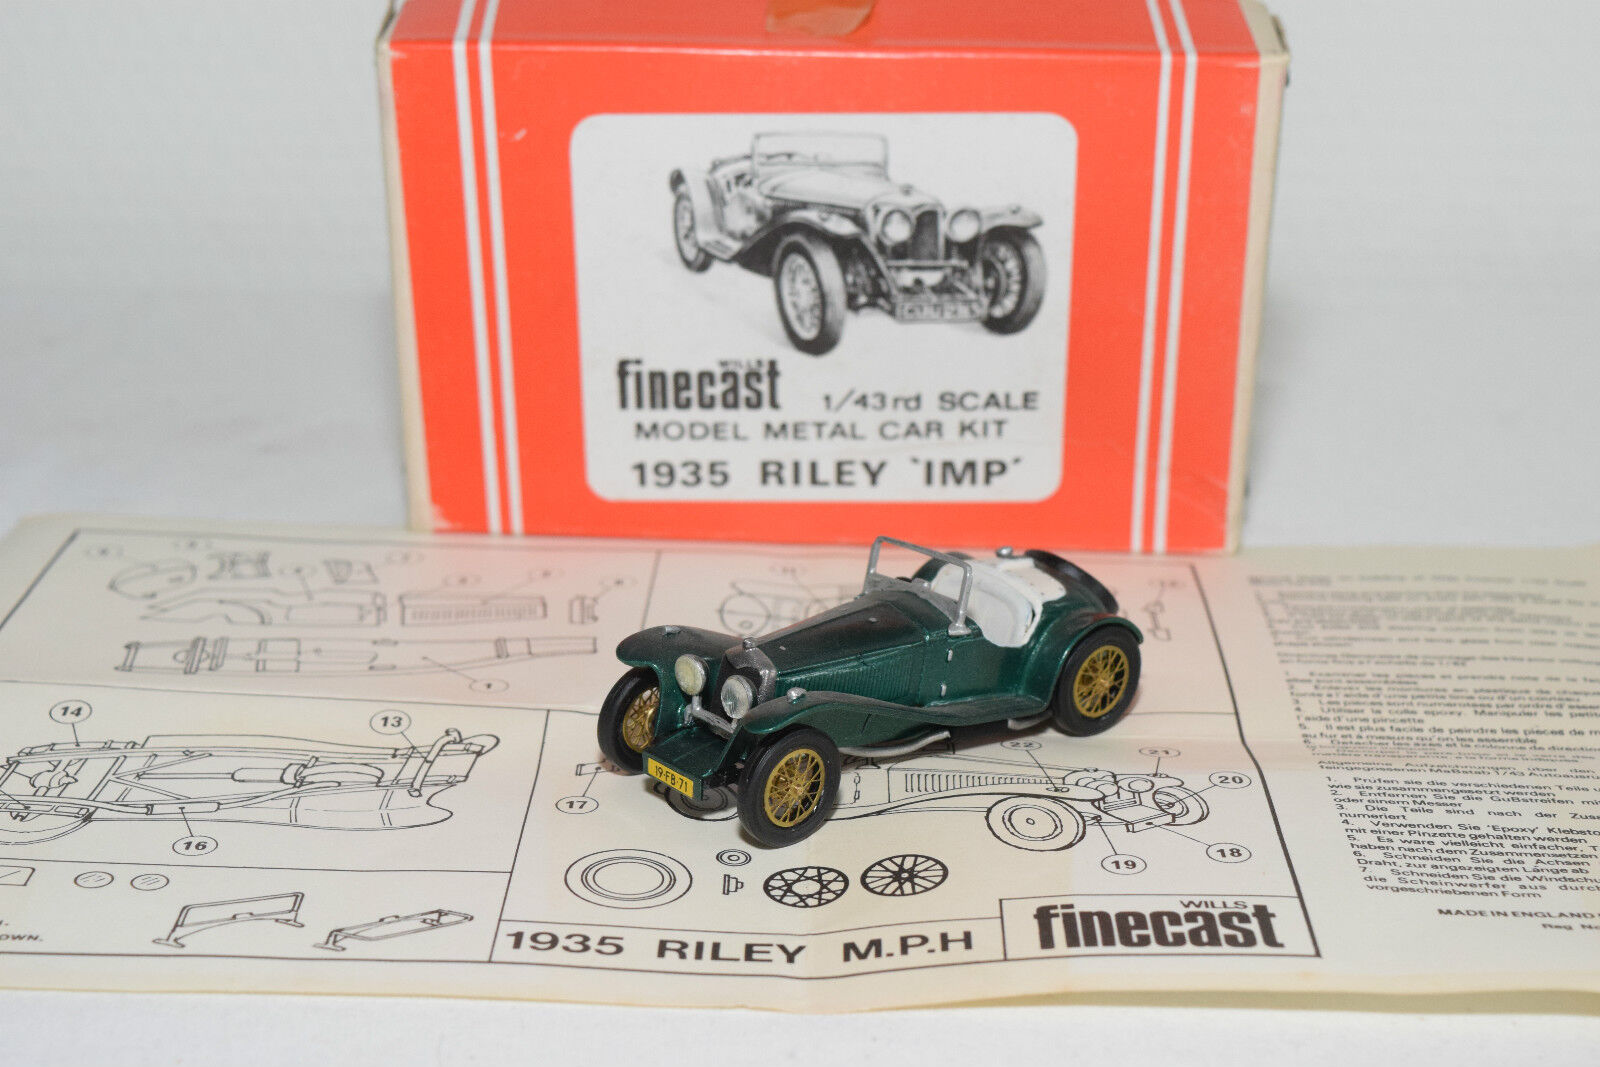 FINECAST WILLS KIT 1935 RILEY IMP METALLIC METALLIC METALLIC GREEN VN MINT BOXED RARE SELTEN 91fa7a